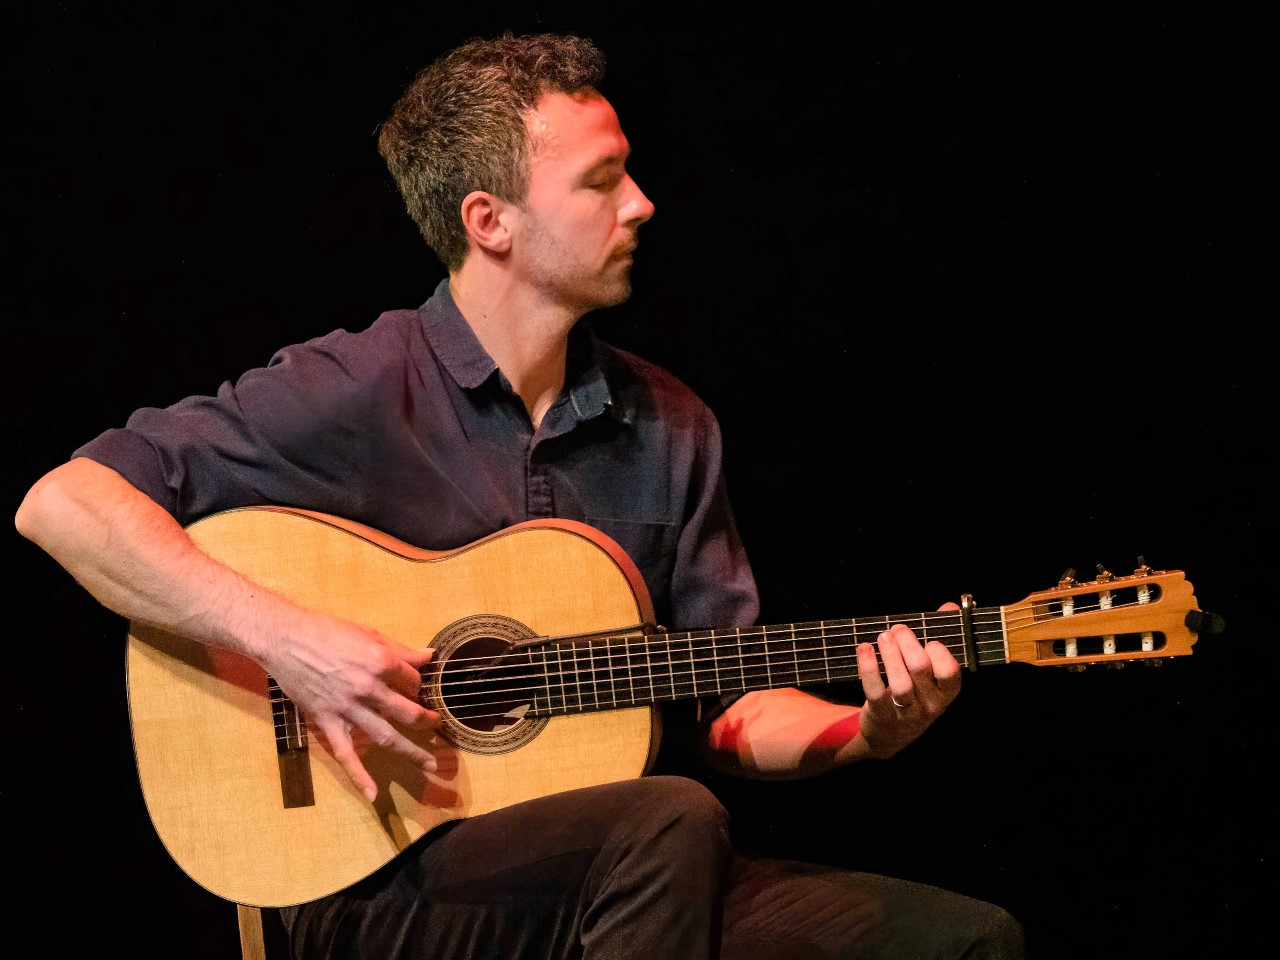 dan macneil playing flamenco guitar on stage